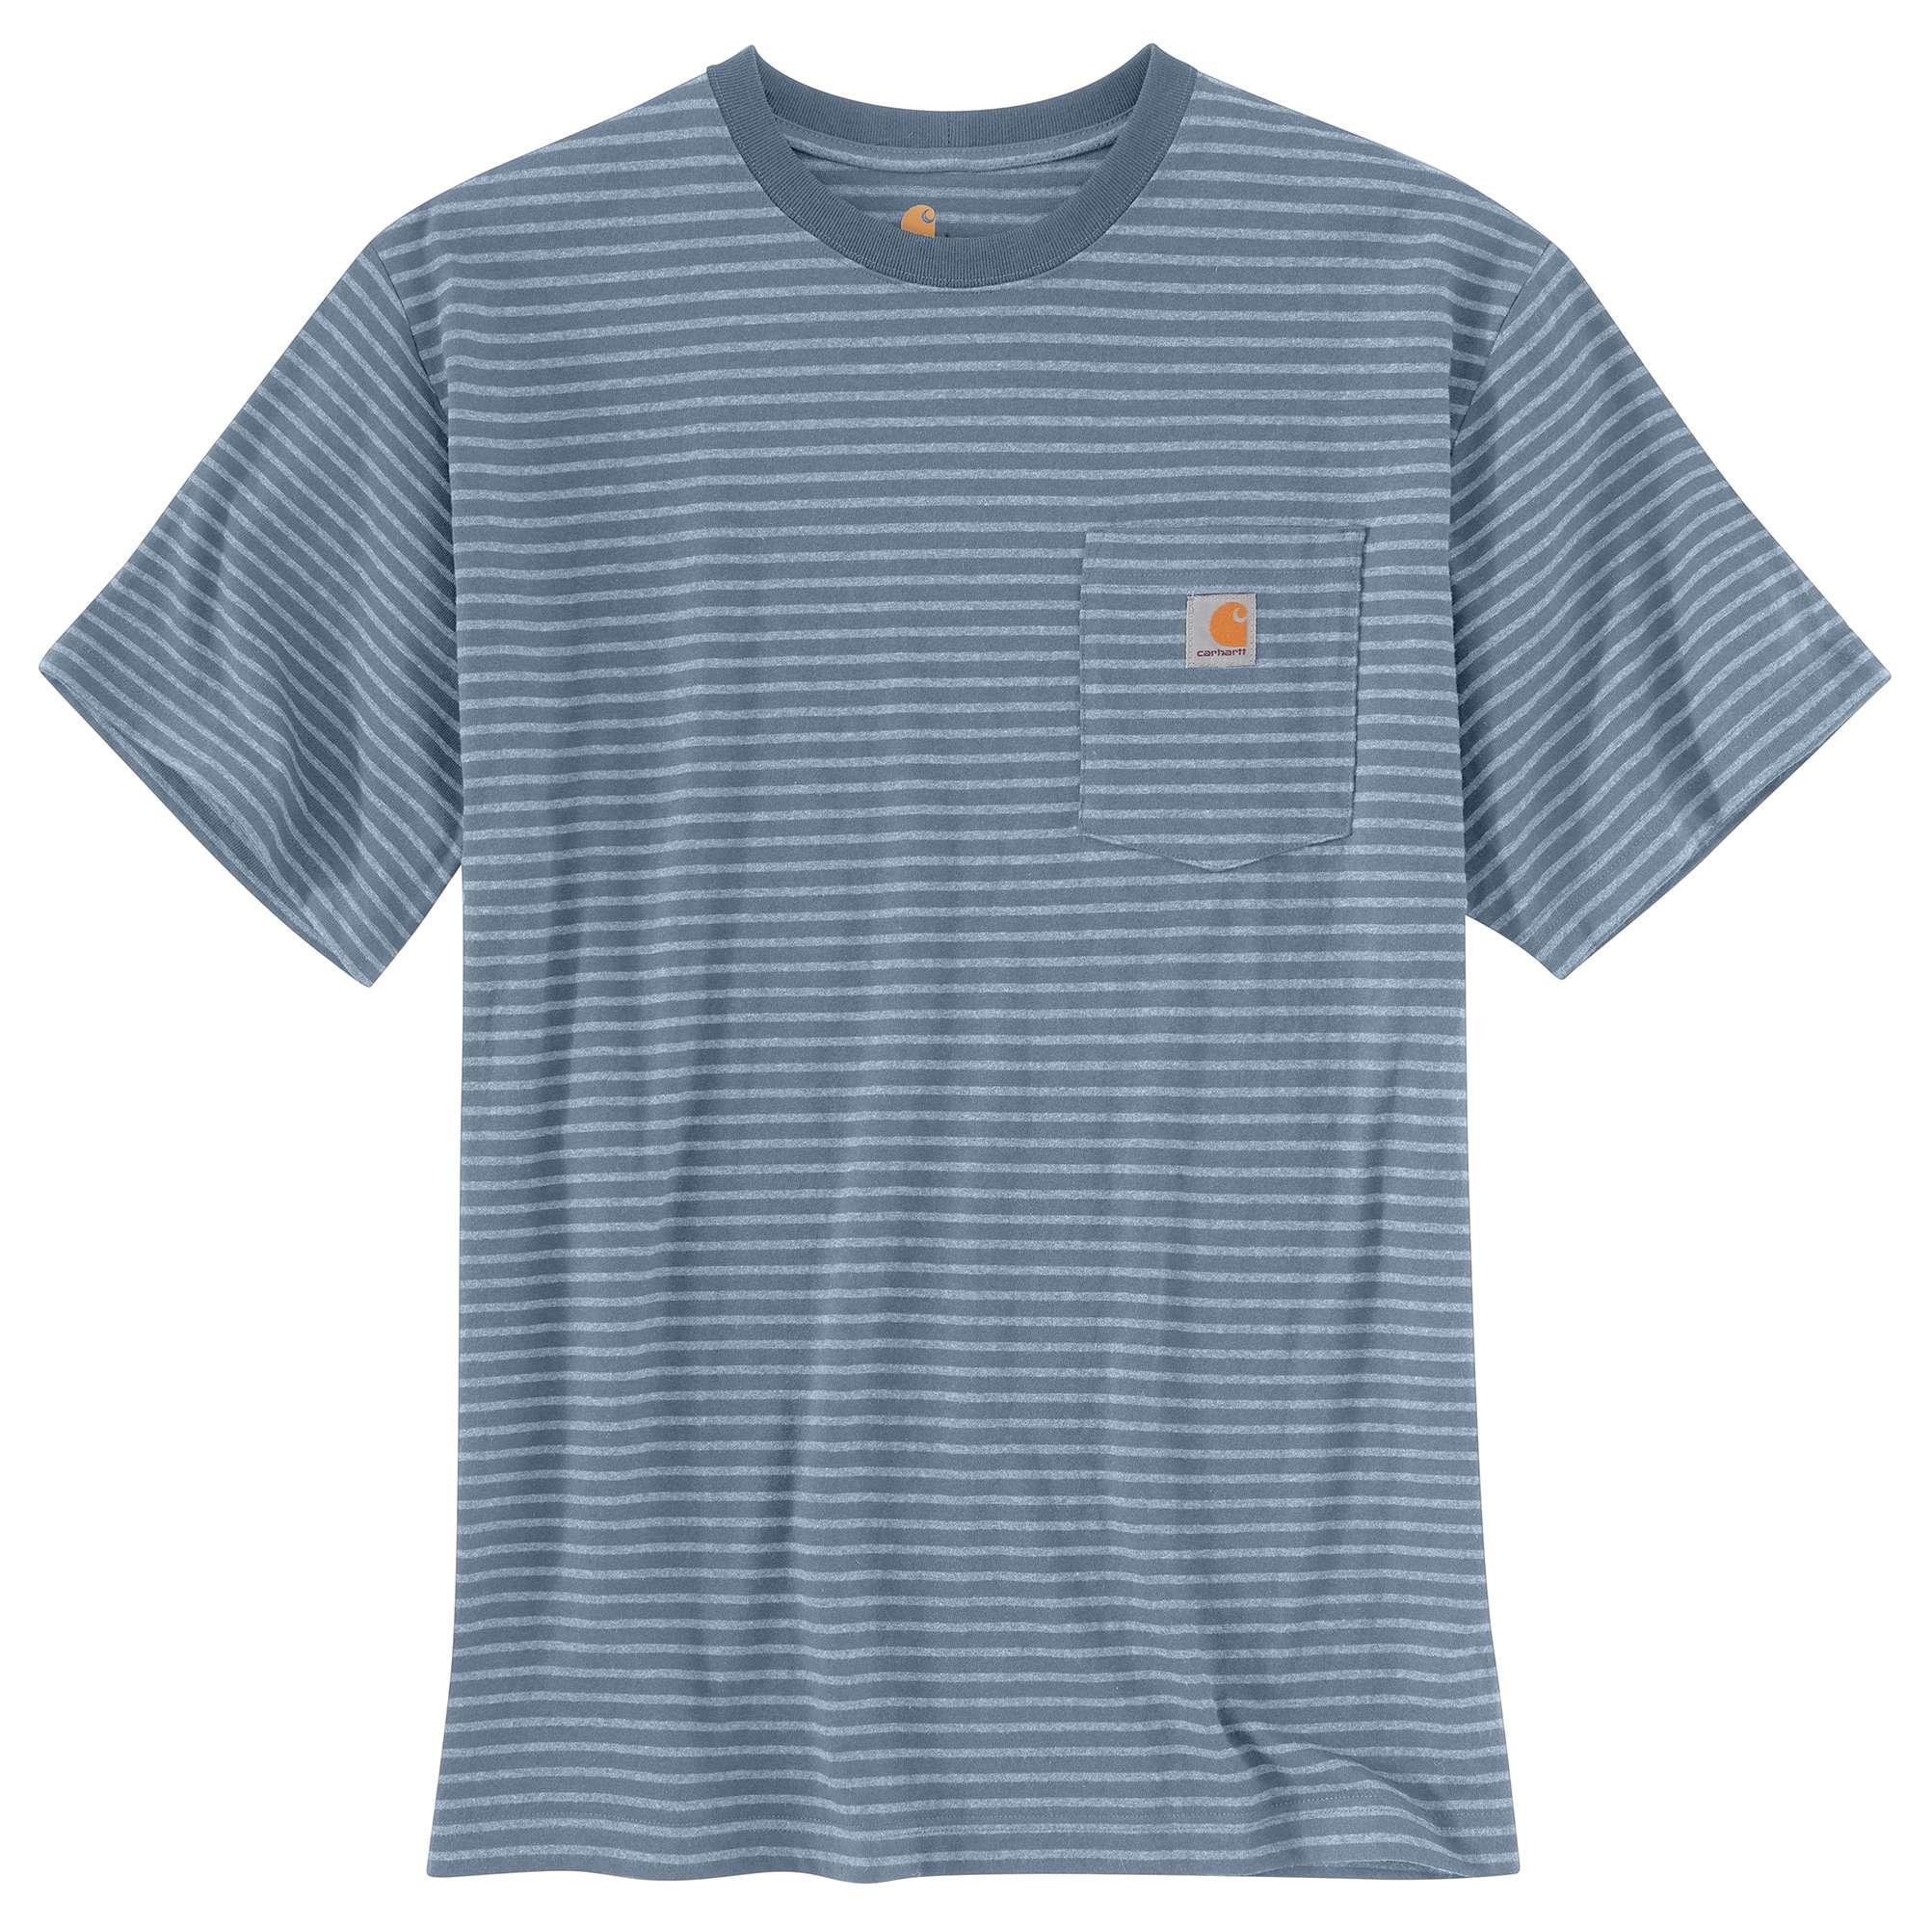 Men's Workwear Pocket Tee, Blue/Gray, swatch